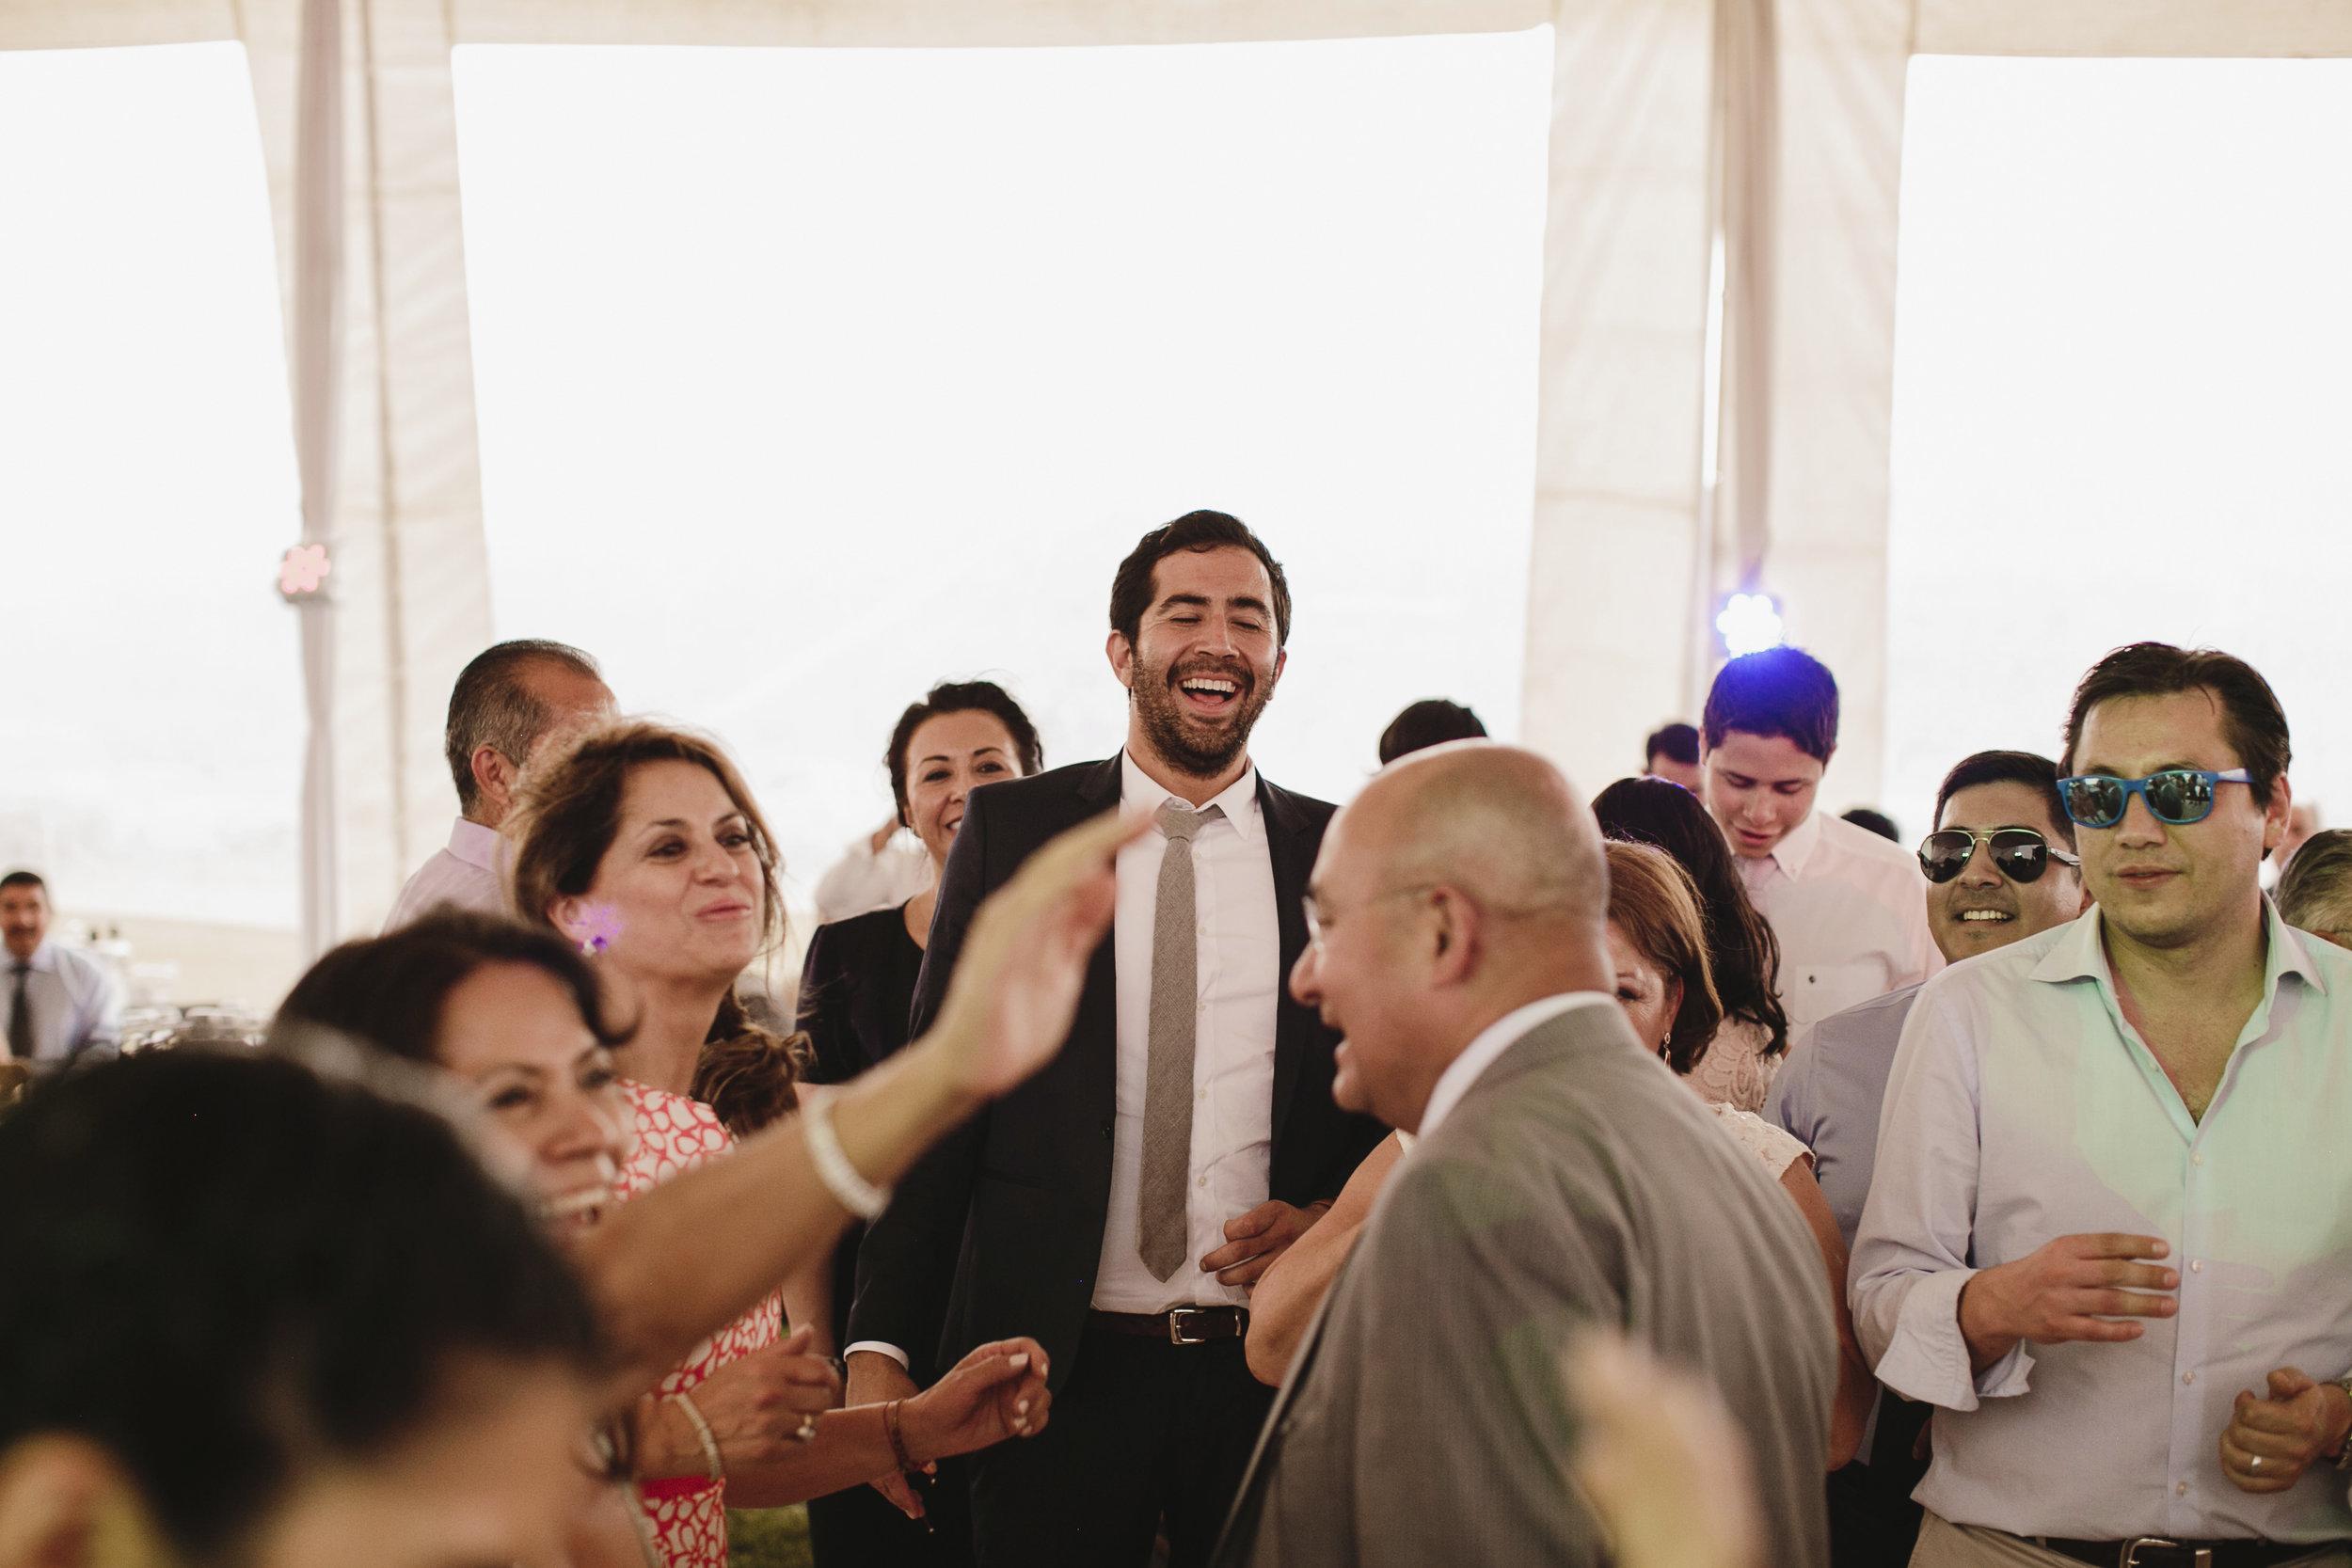 alfons_flores_destination_wedding_photography_mavi_david-1701.JPG